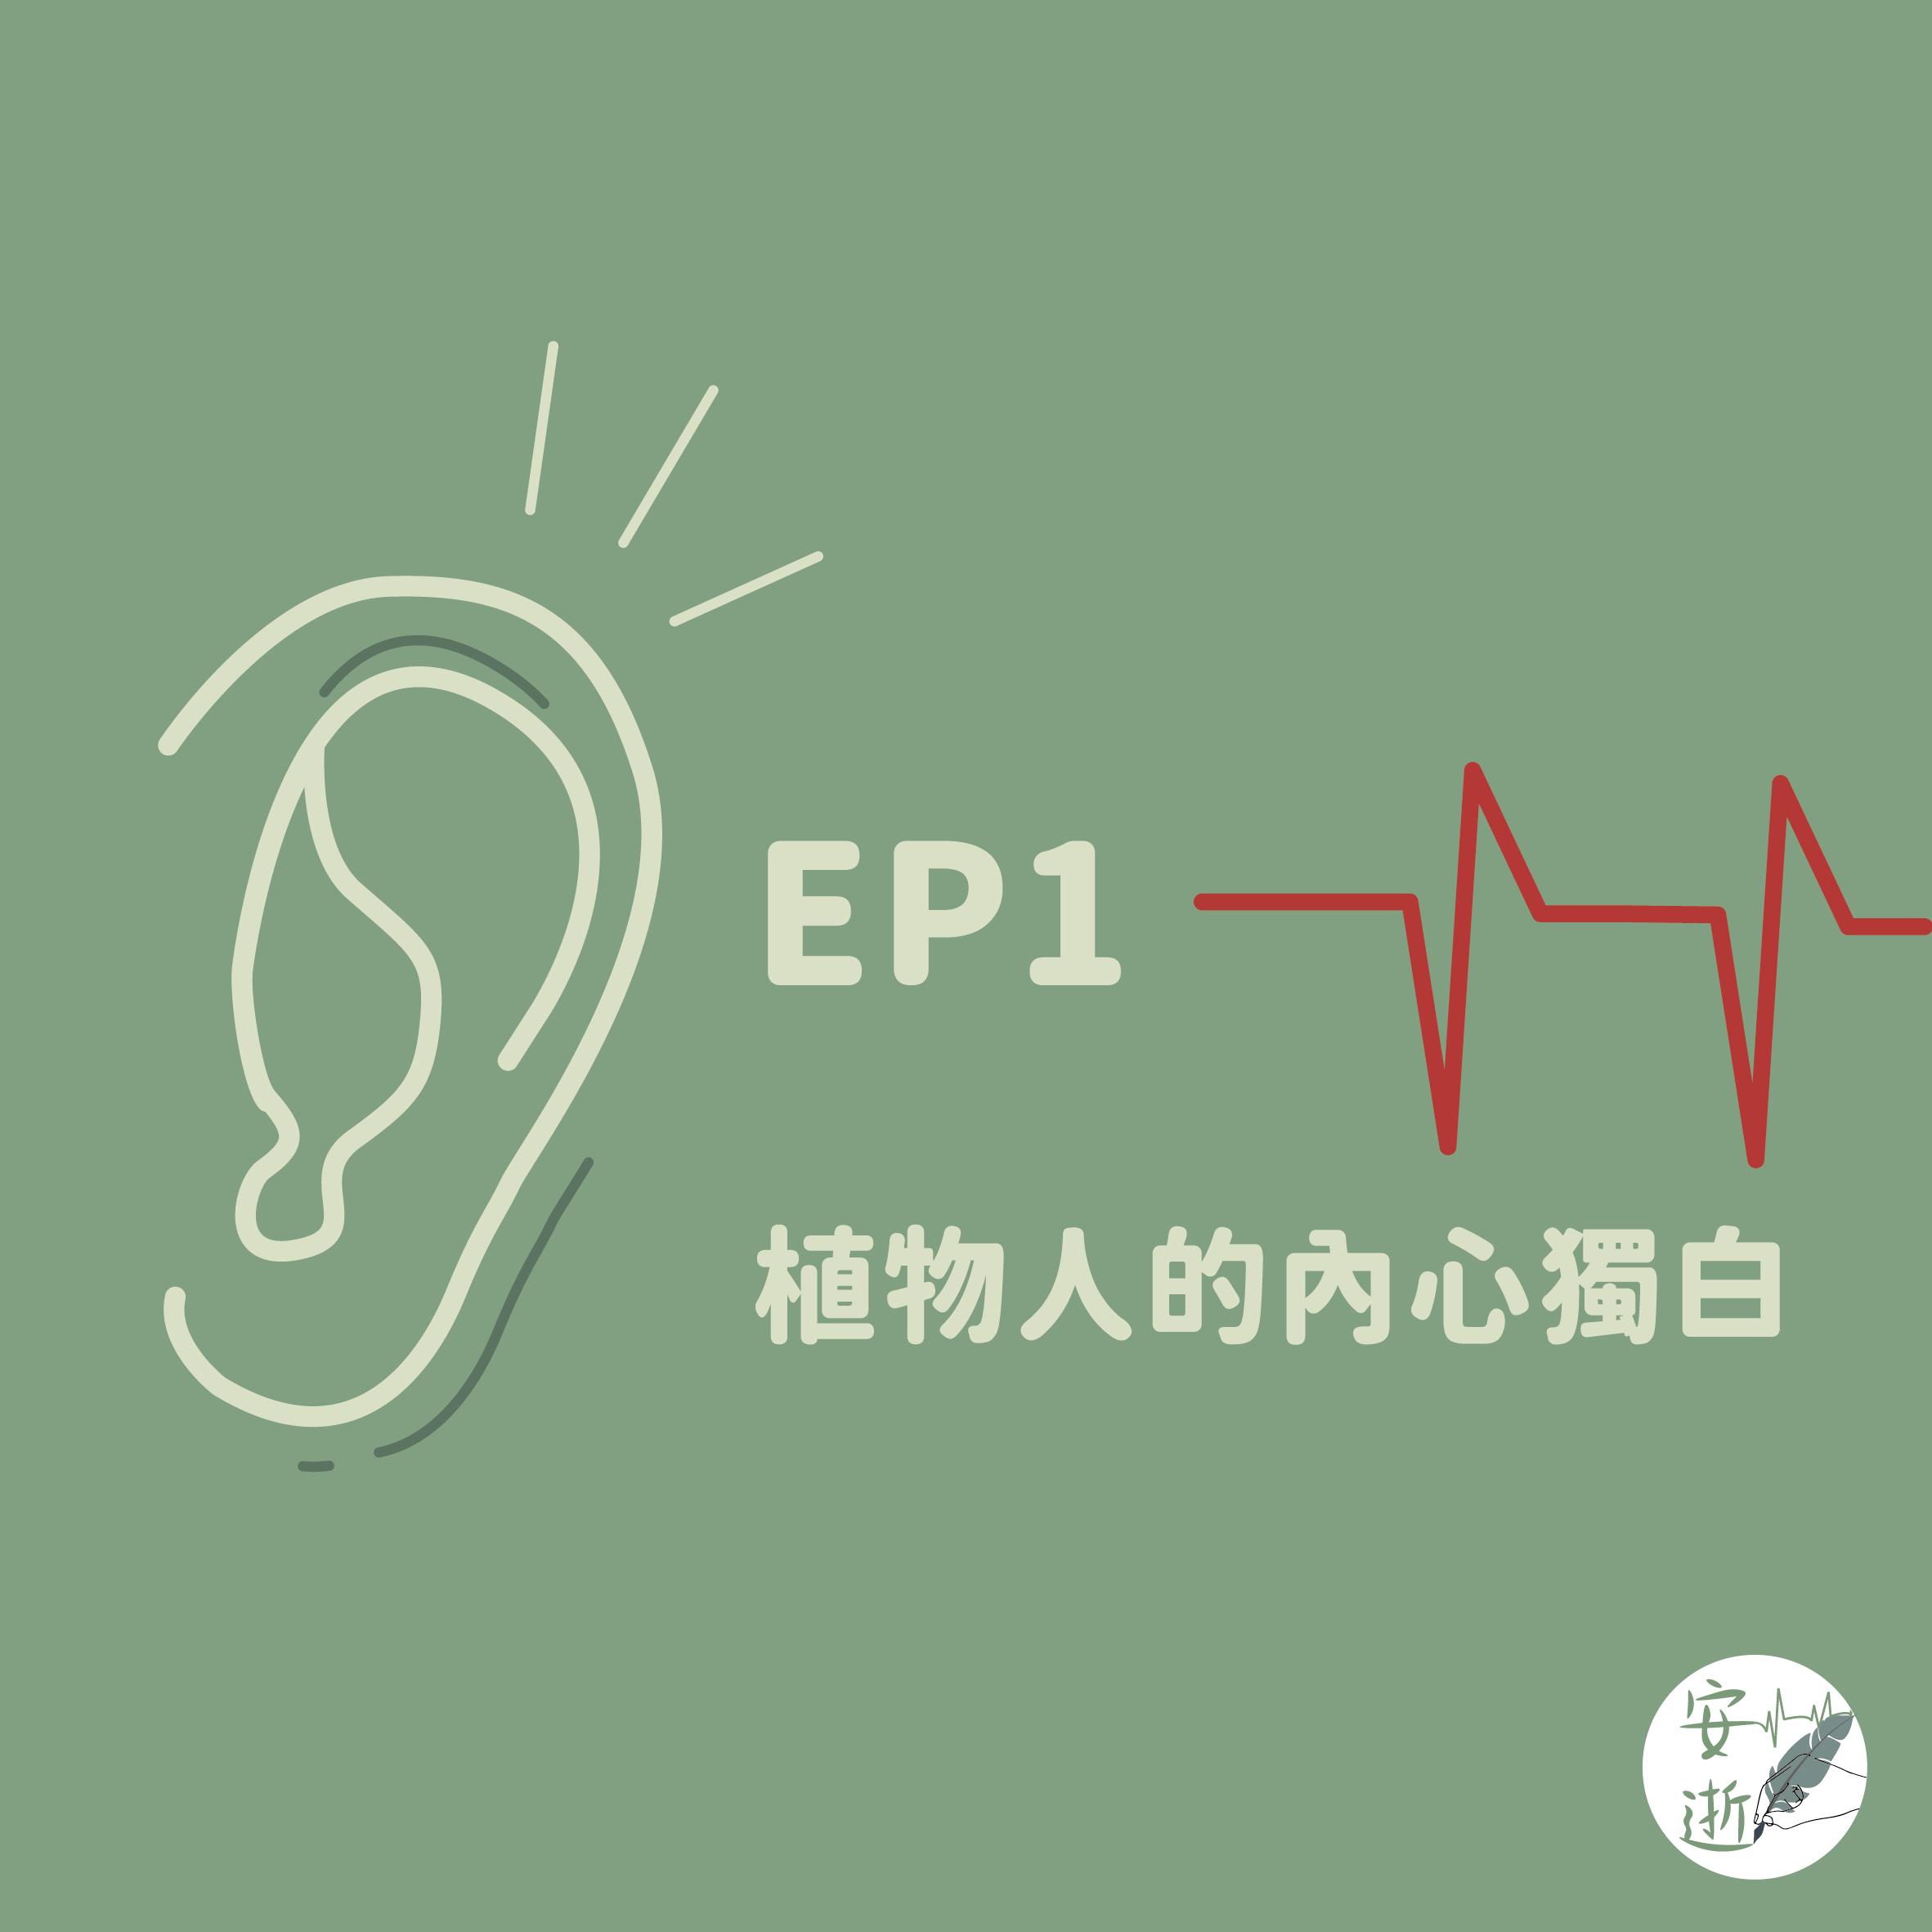 EP1_植物人的內心獨白